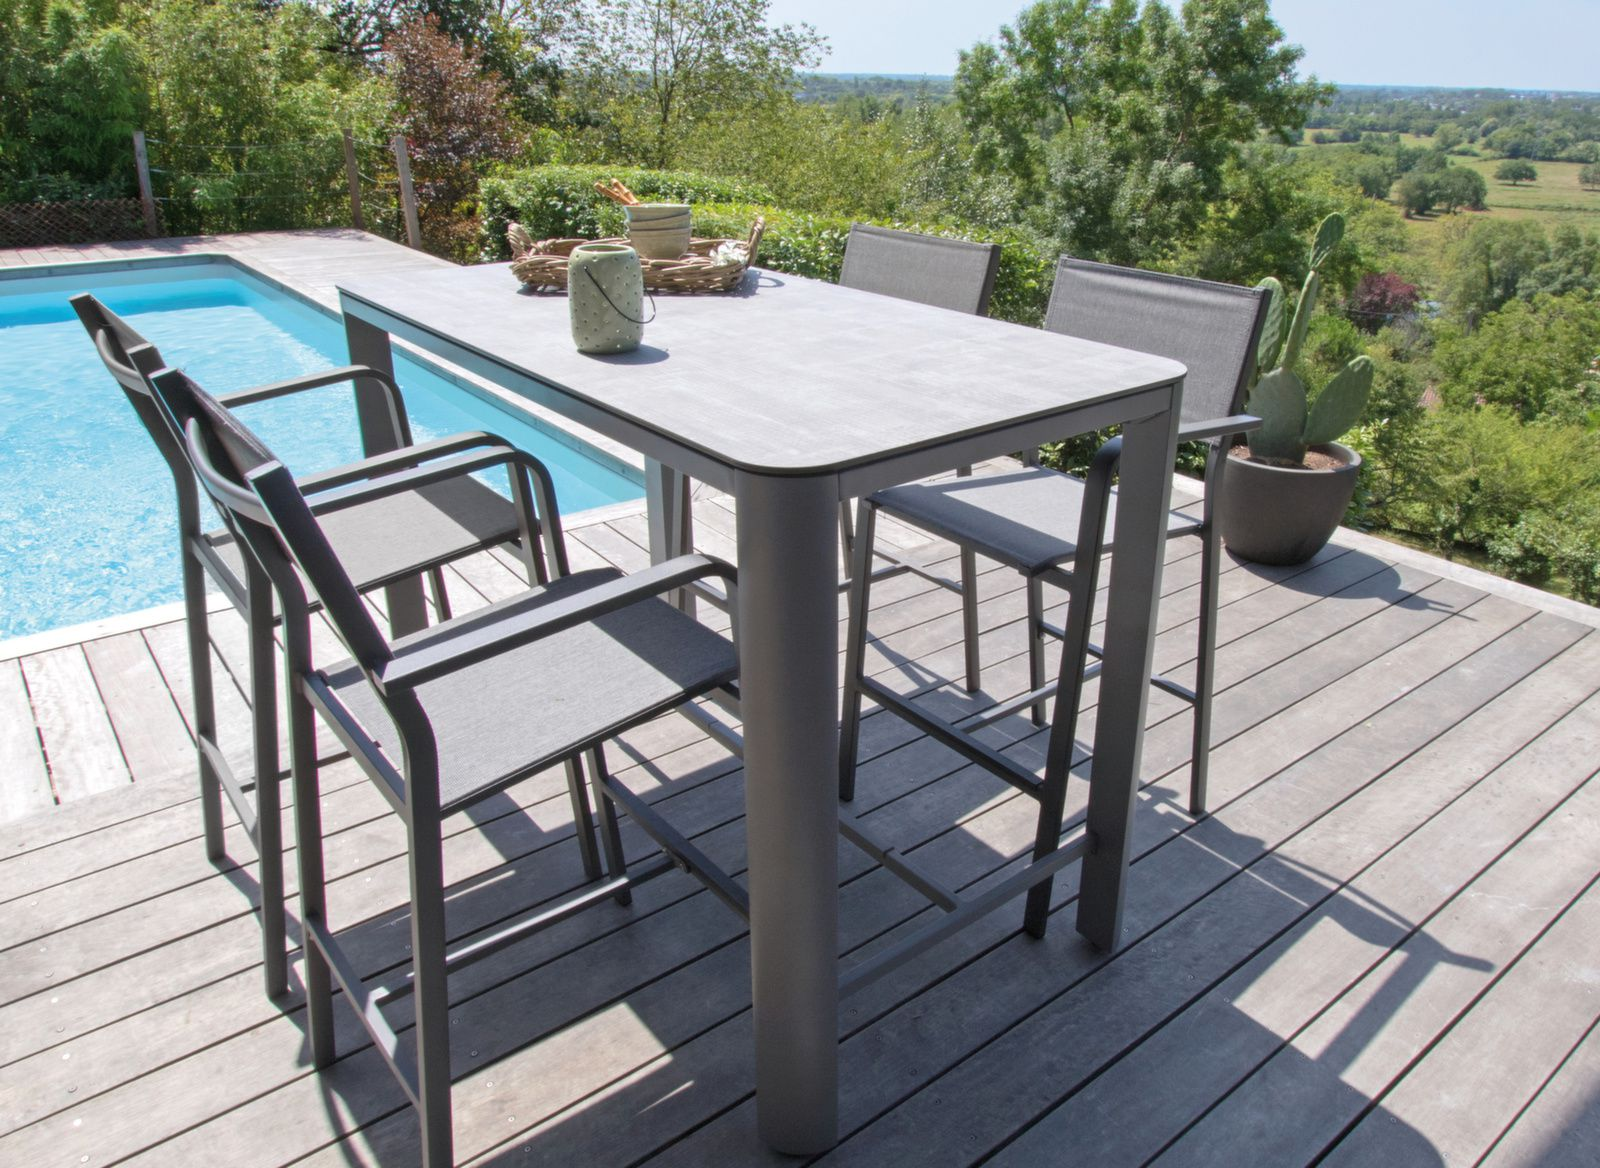 077bee57a2336a Table Eole Haute 150x75, Plateau Trespa® - Tables hautes de jardin